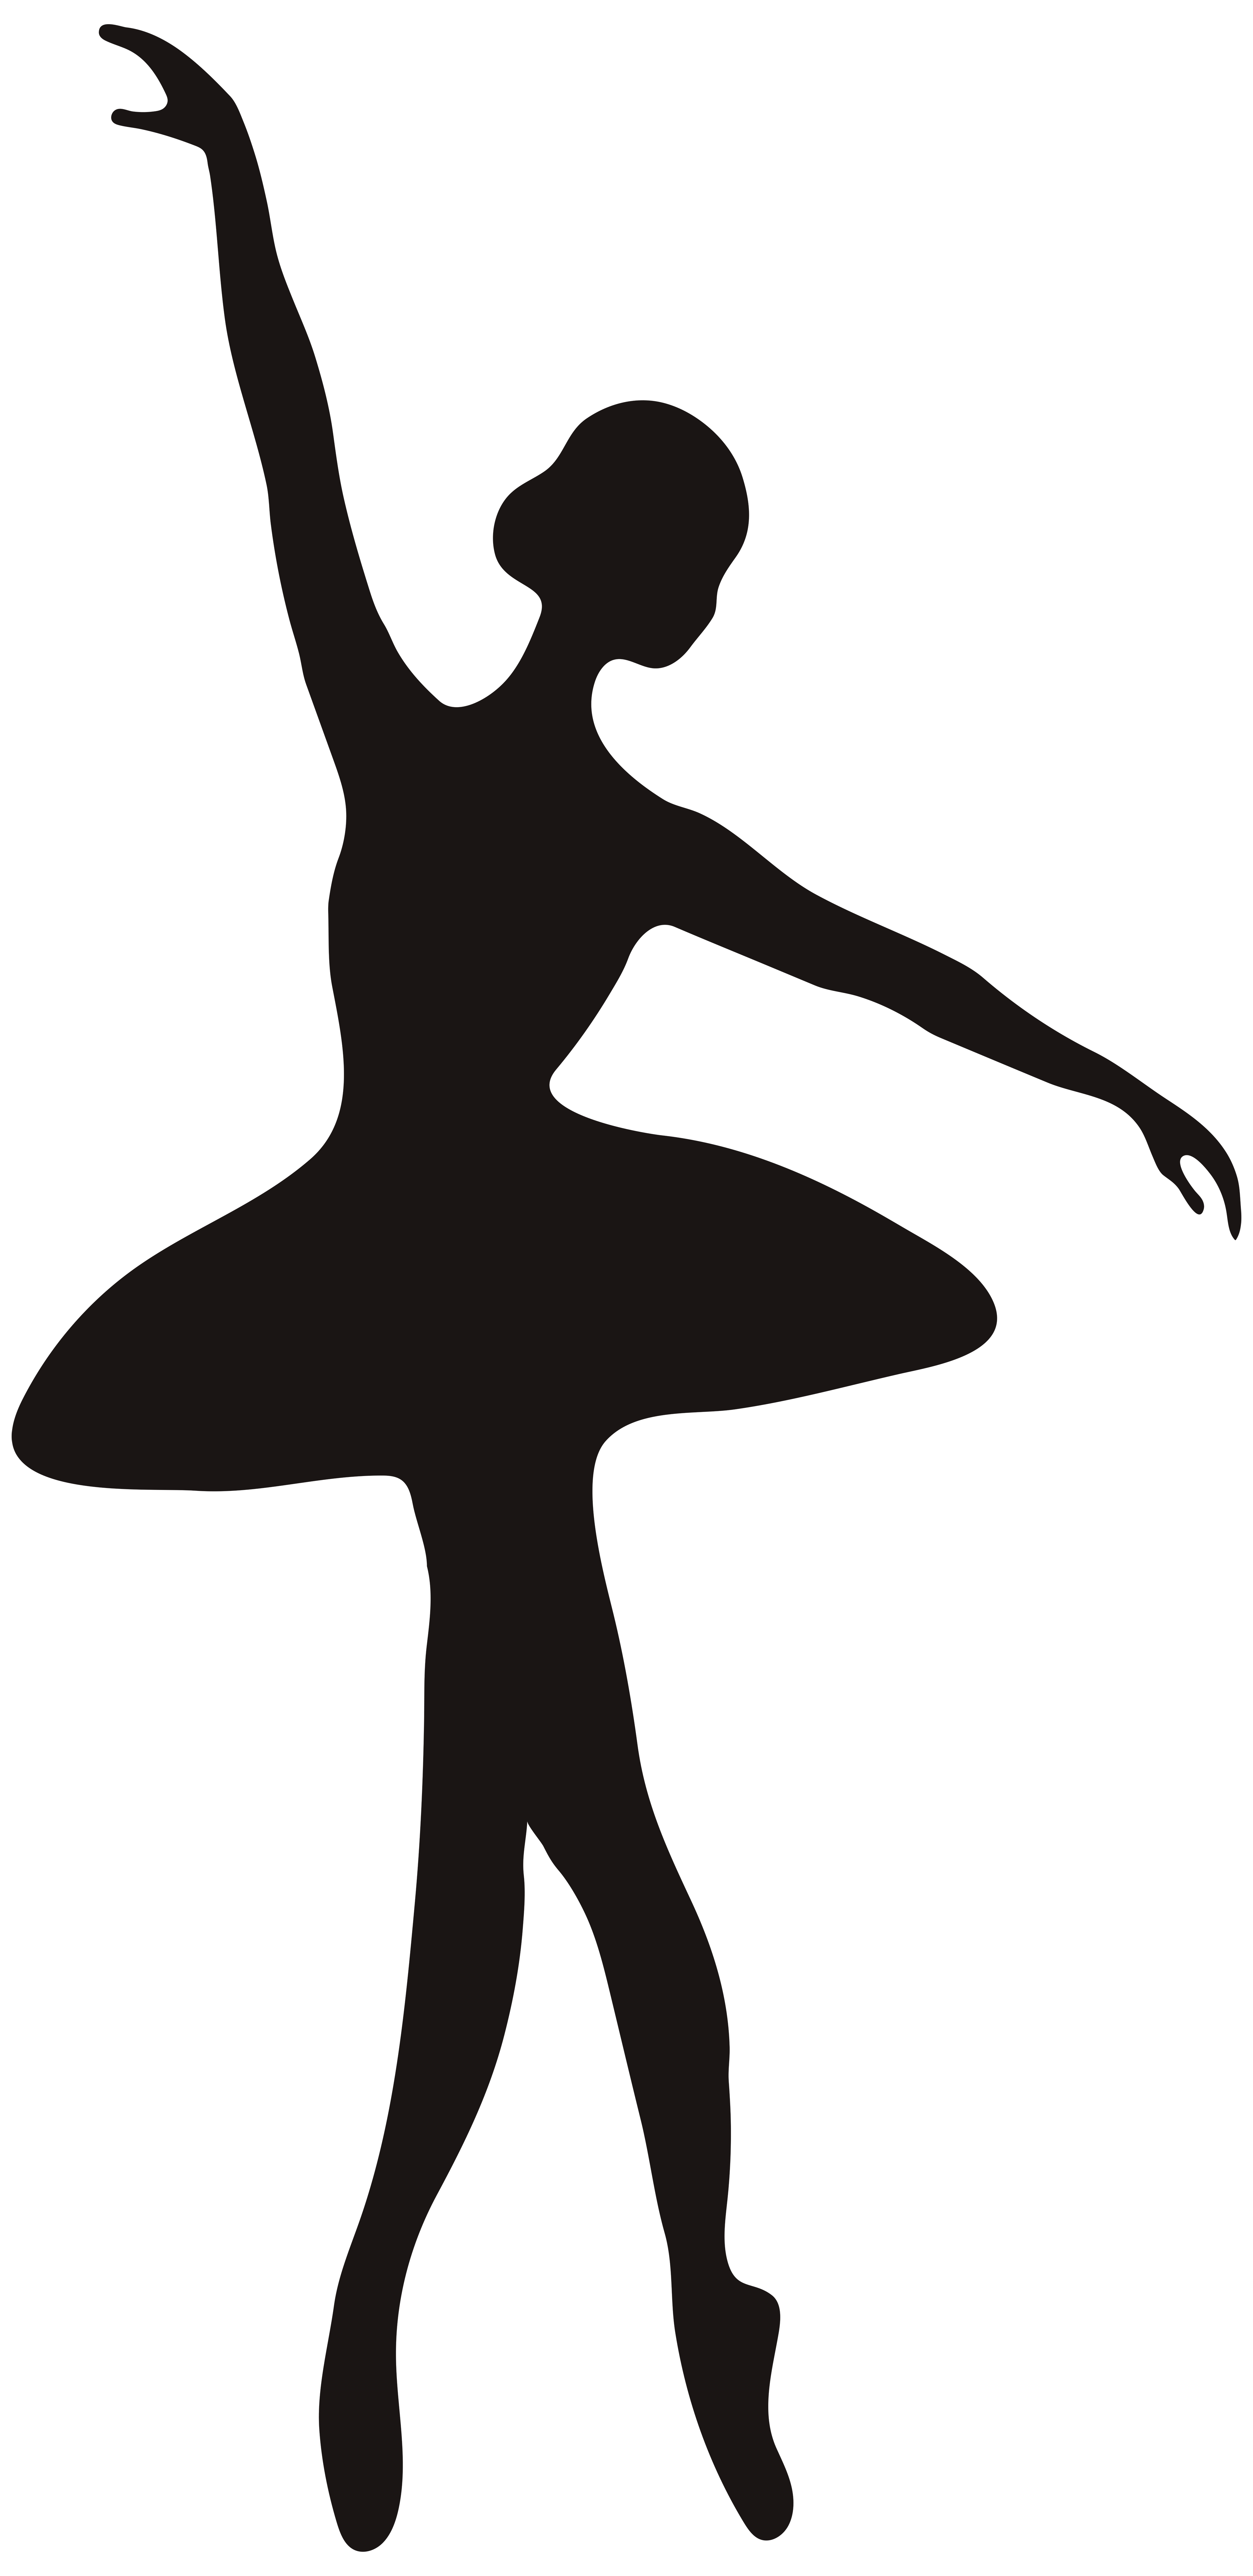 3890x8000 Ballerina Silhouette Png Clip Art Imageu200b Gallery Yopriceville